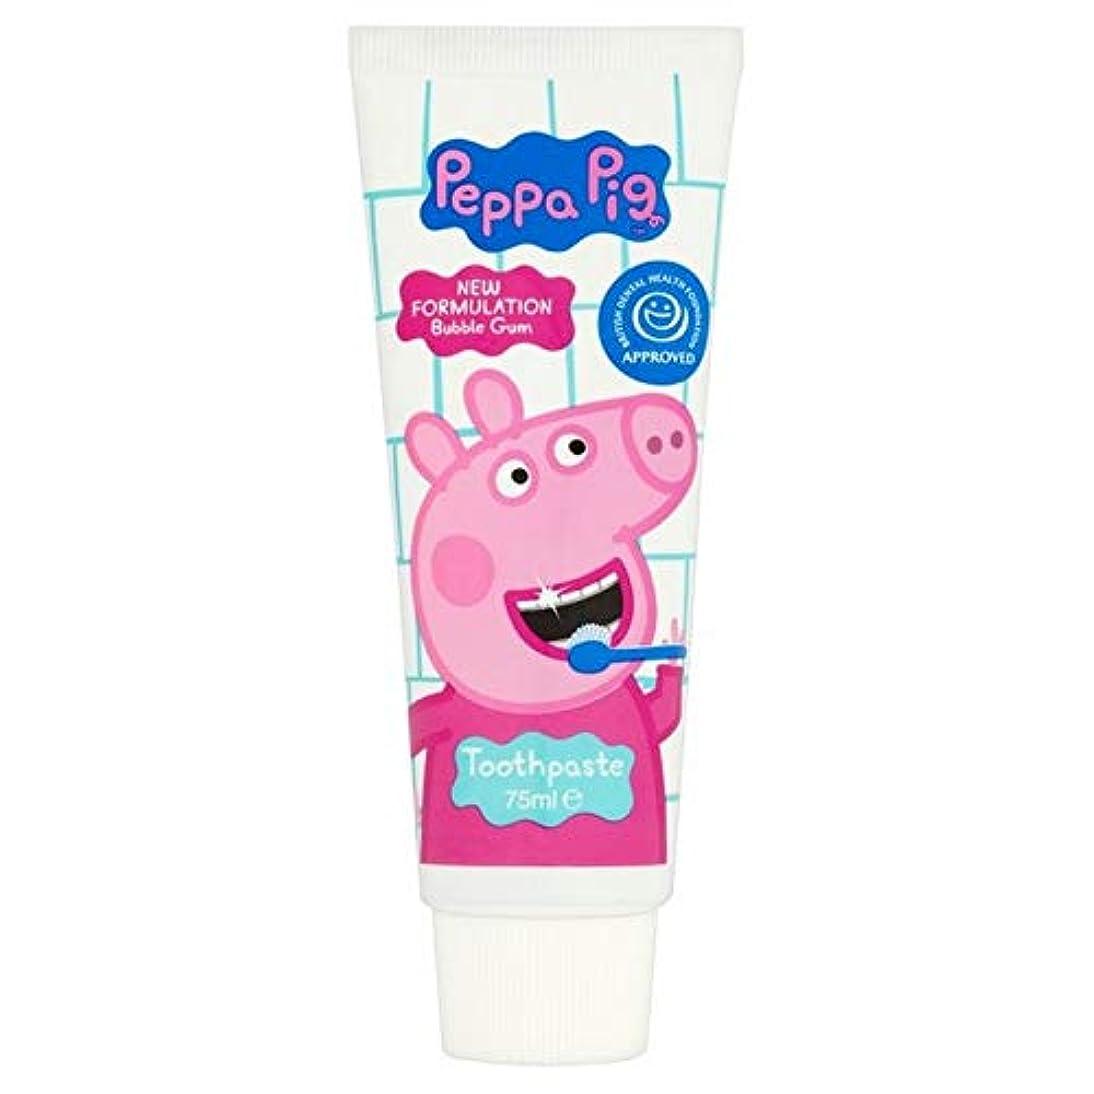 [Peppa Pig] ペッパピッグバブルガム歯磨き粉75ミリリットル - Peppa Pig Bubble Gum Toothpaste 75ml [並行輸入品]